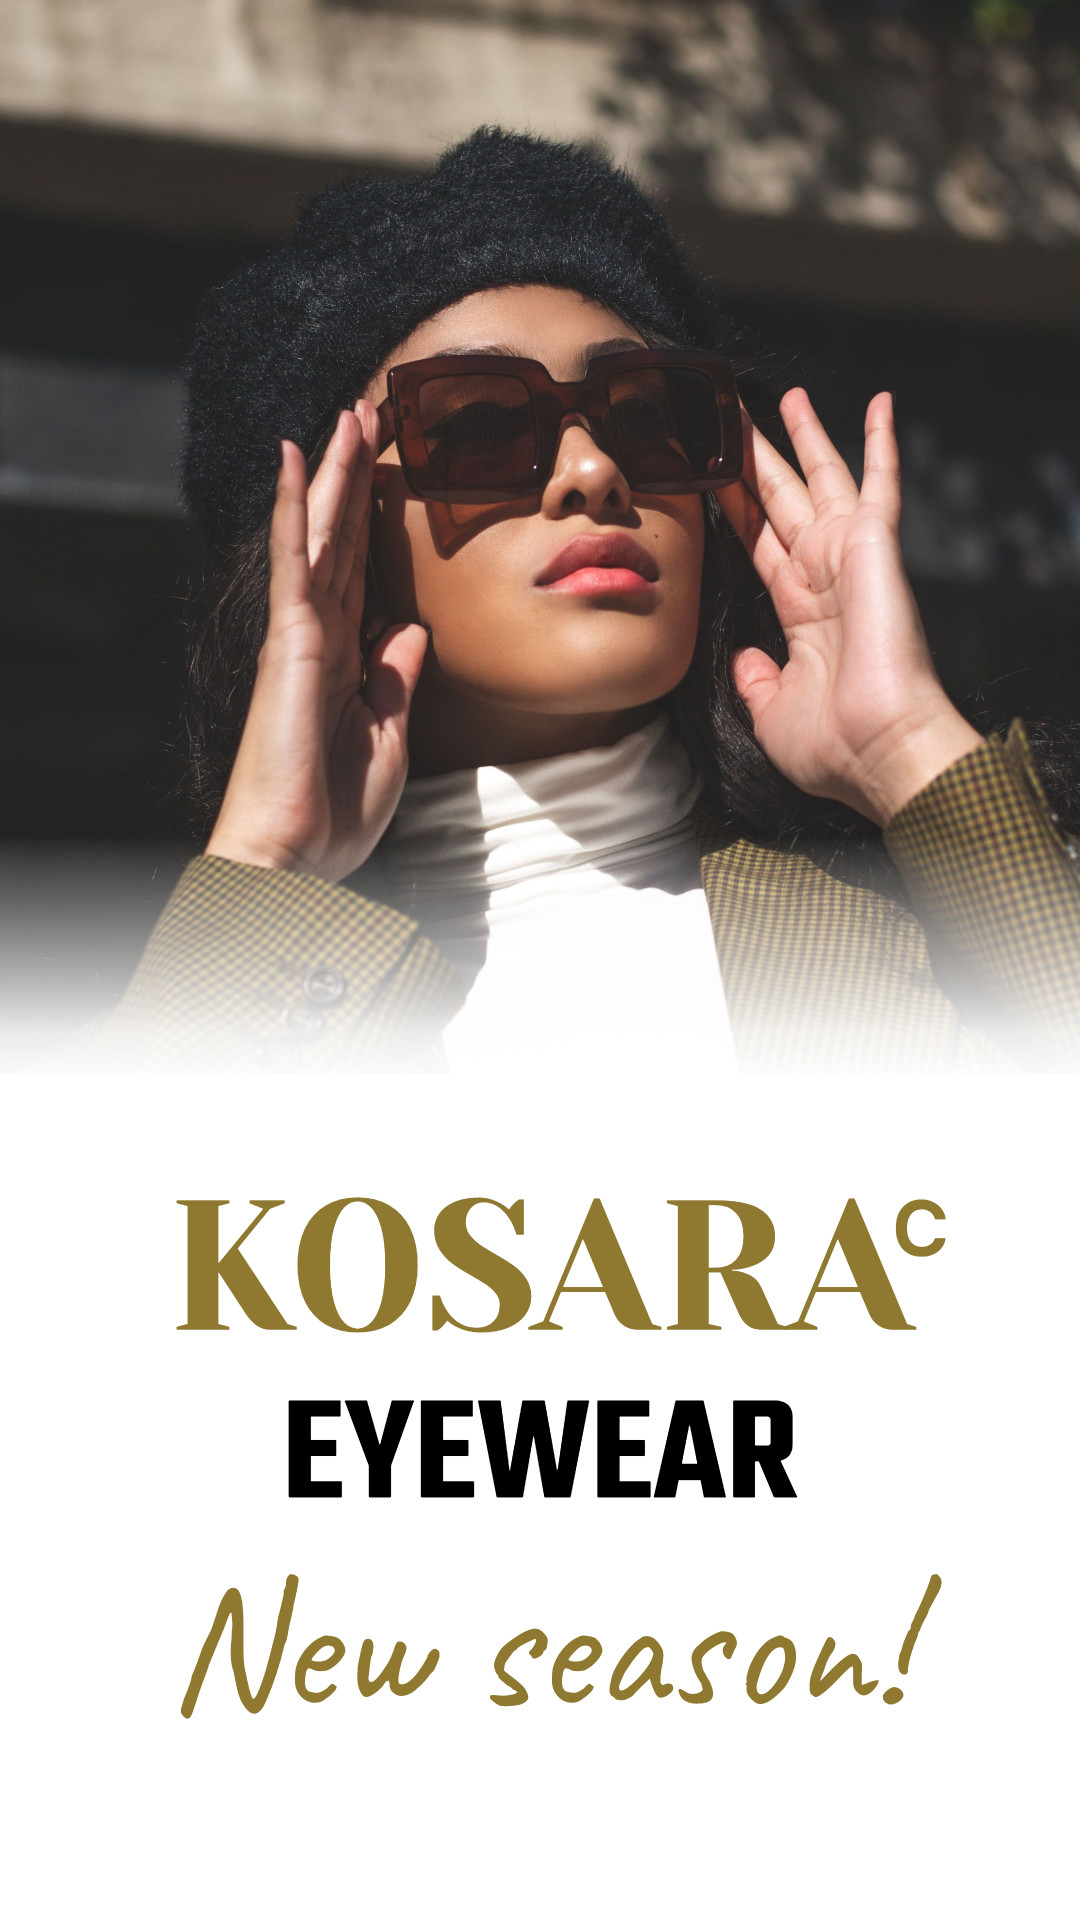 Kosara eyewear new season